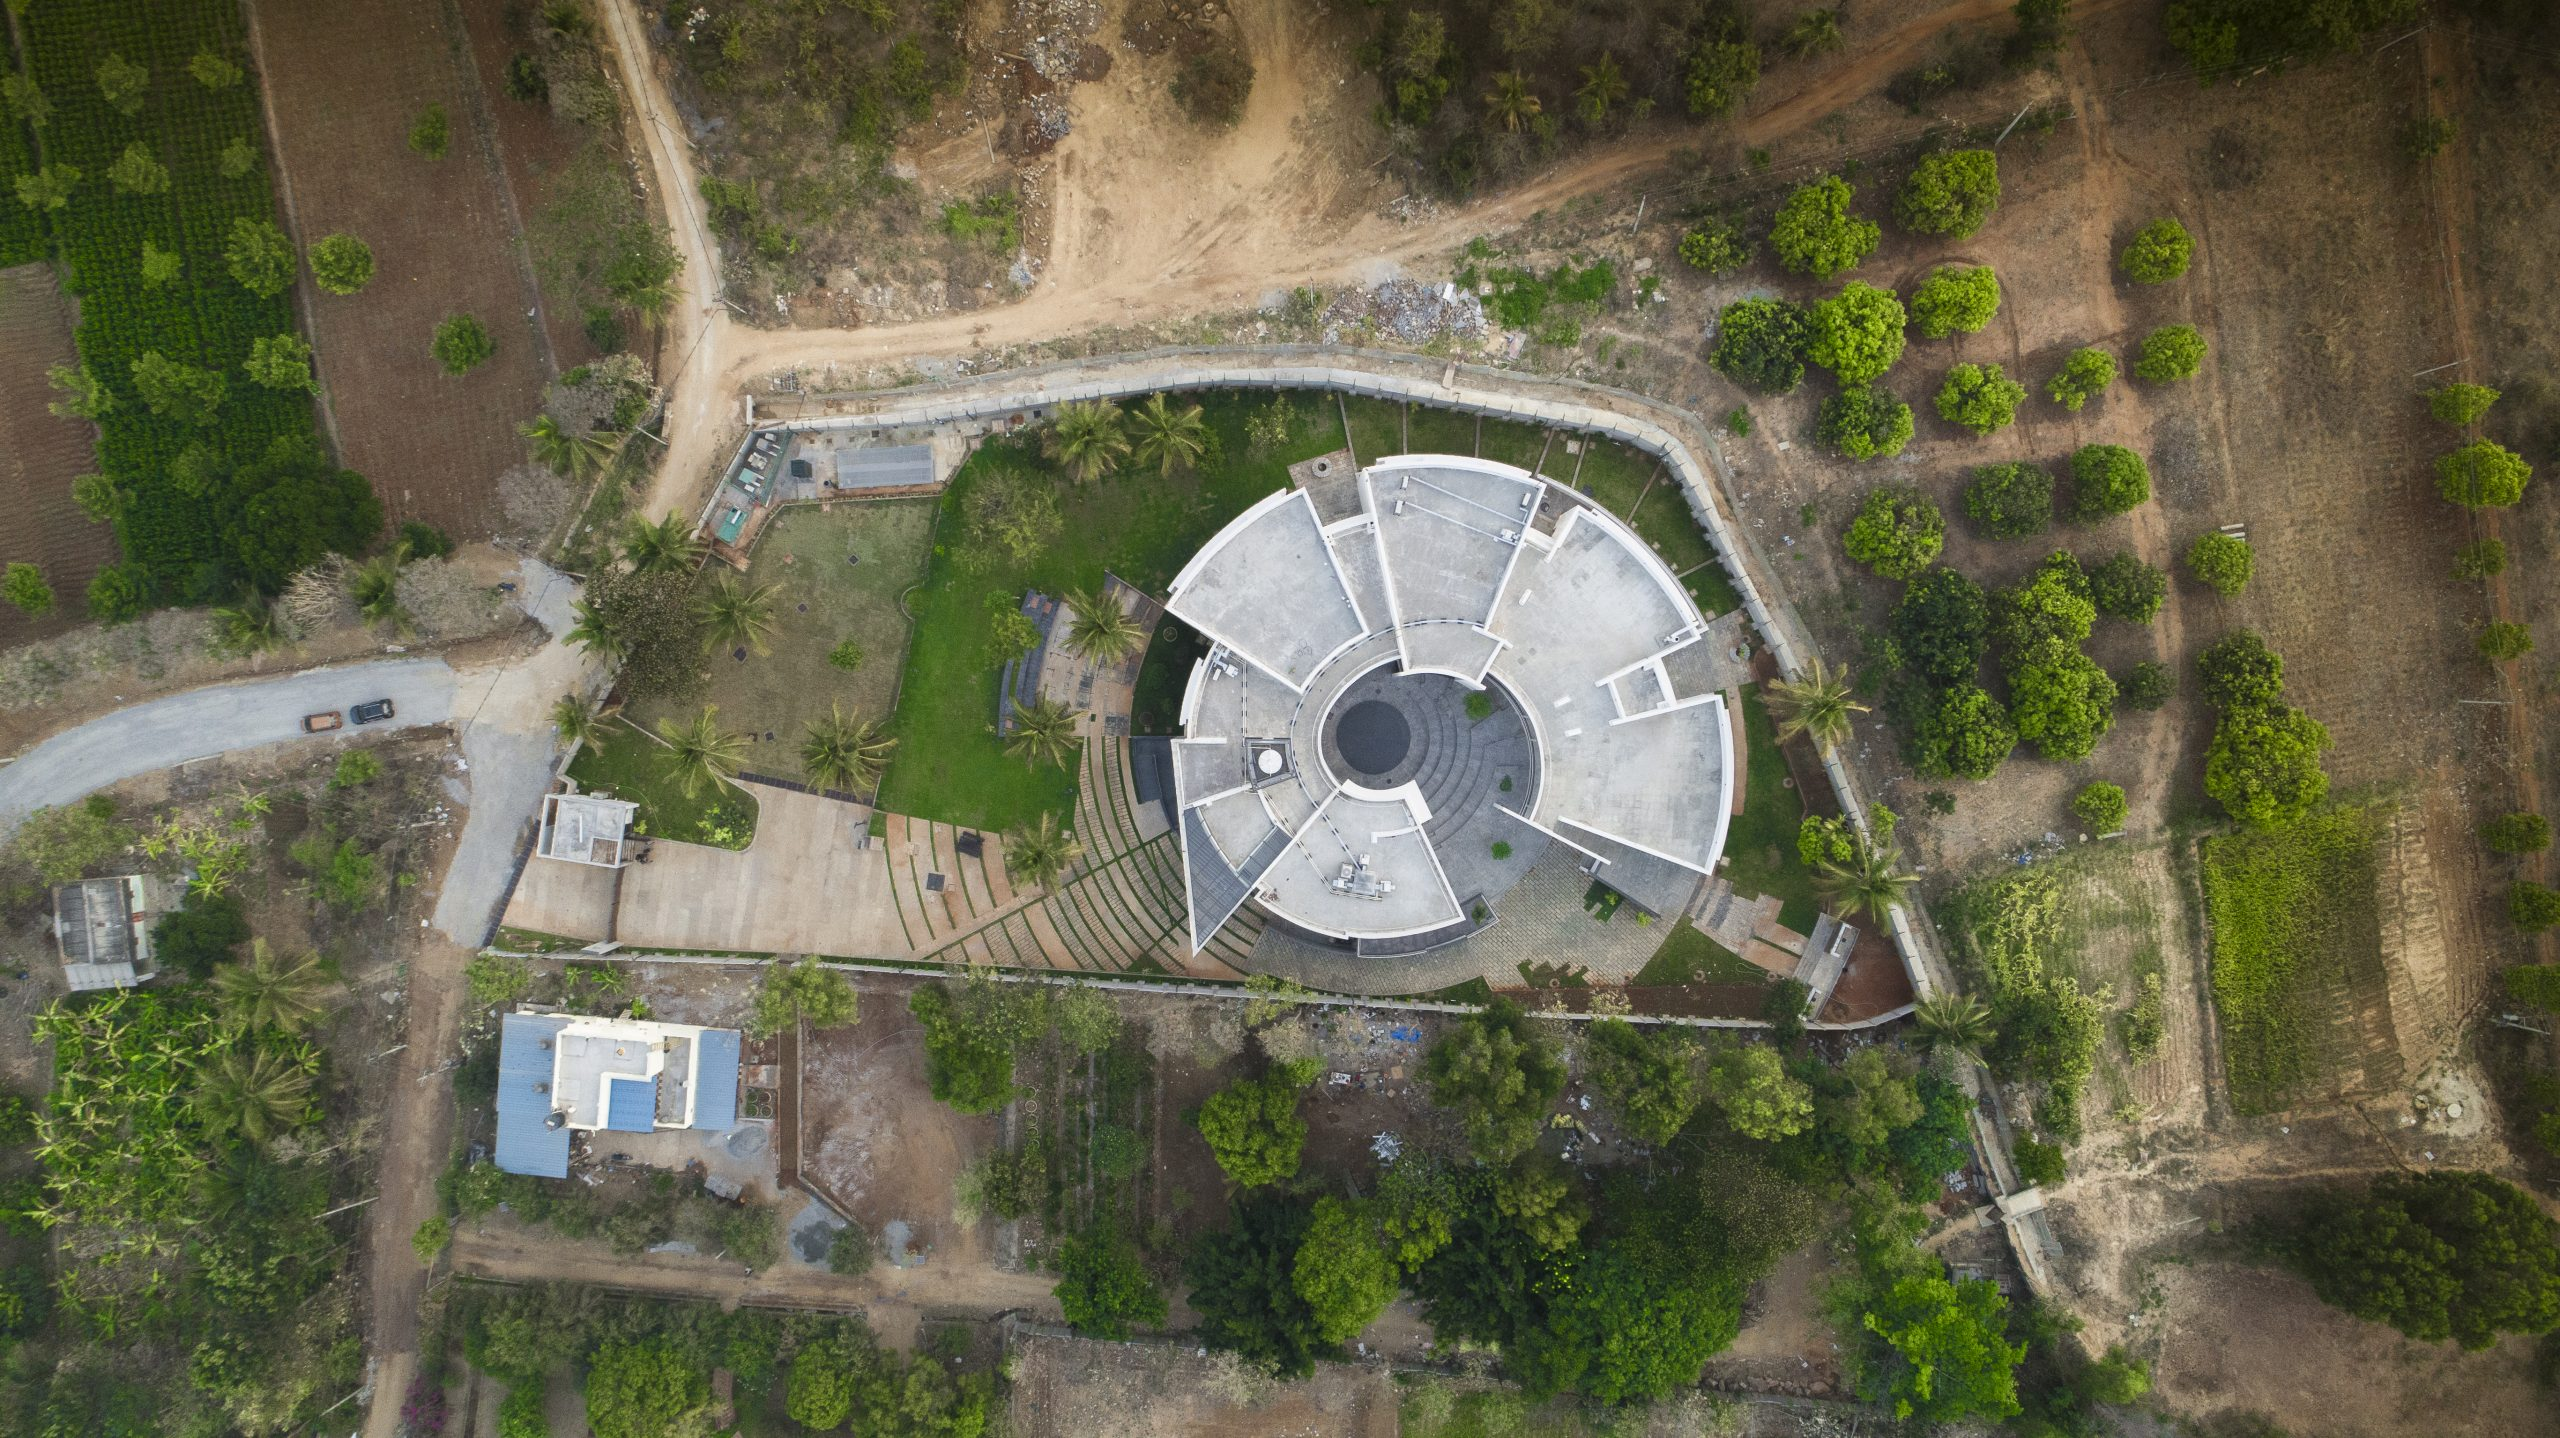 Prayoga Drone 2